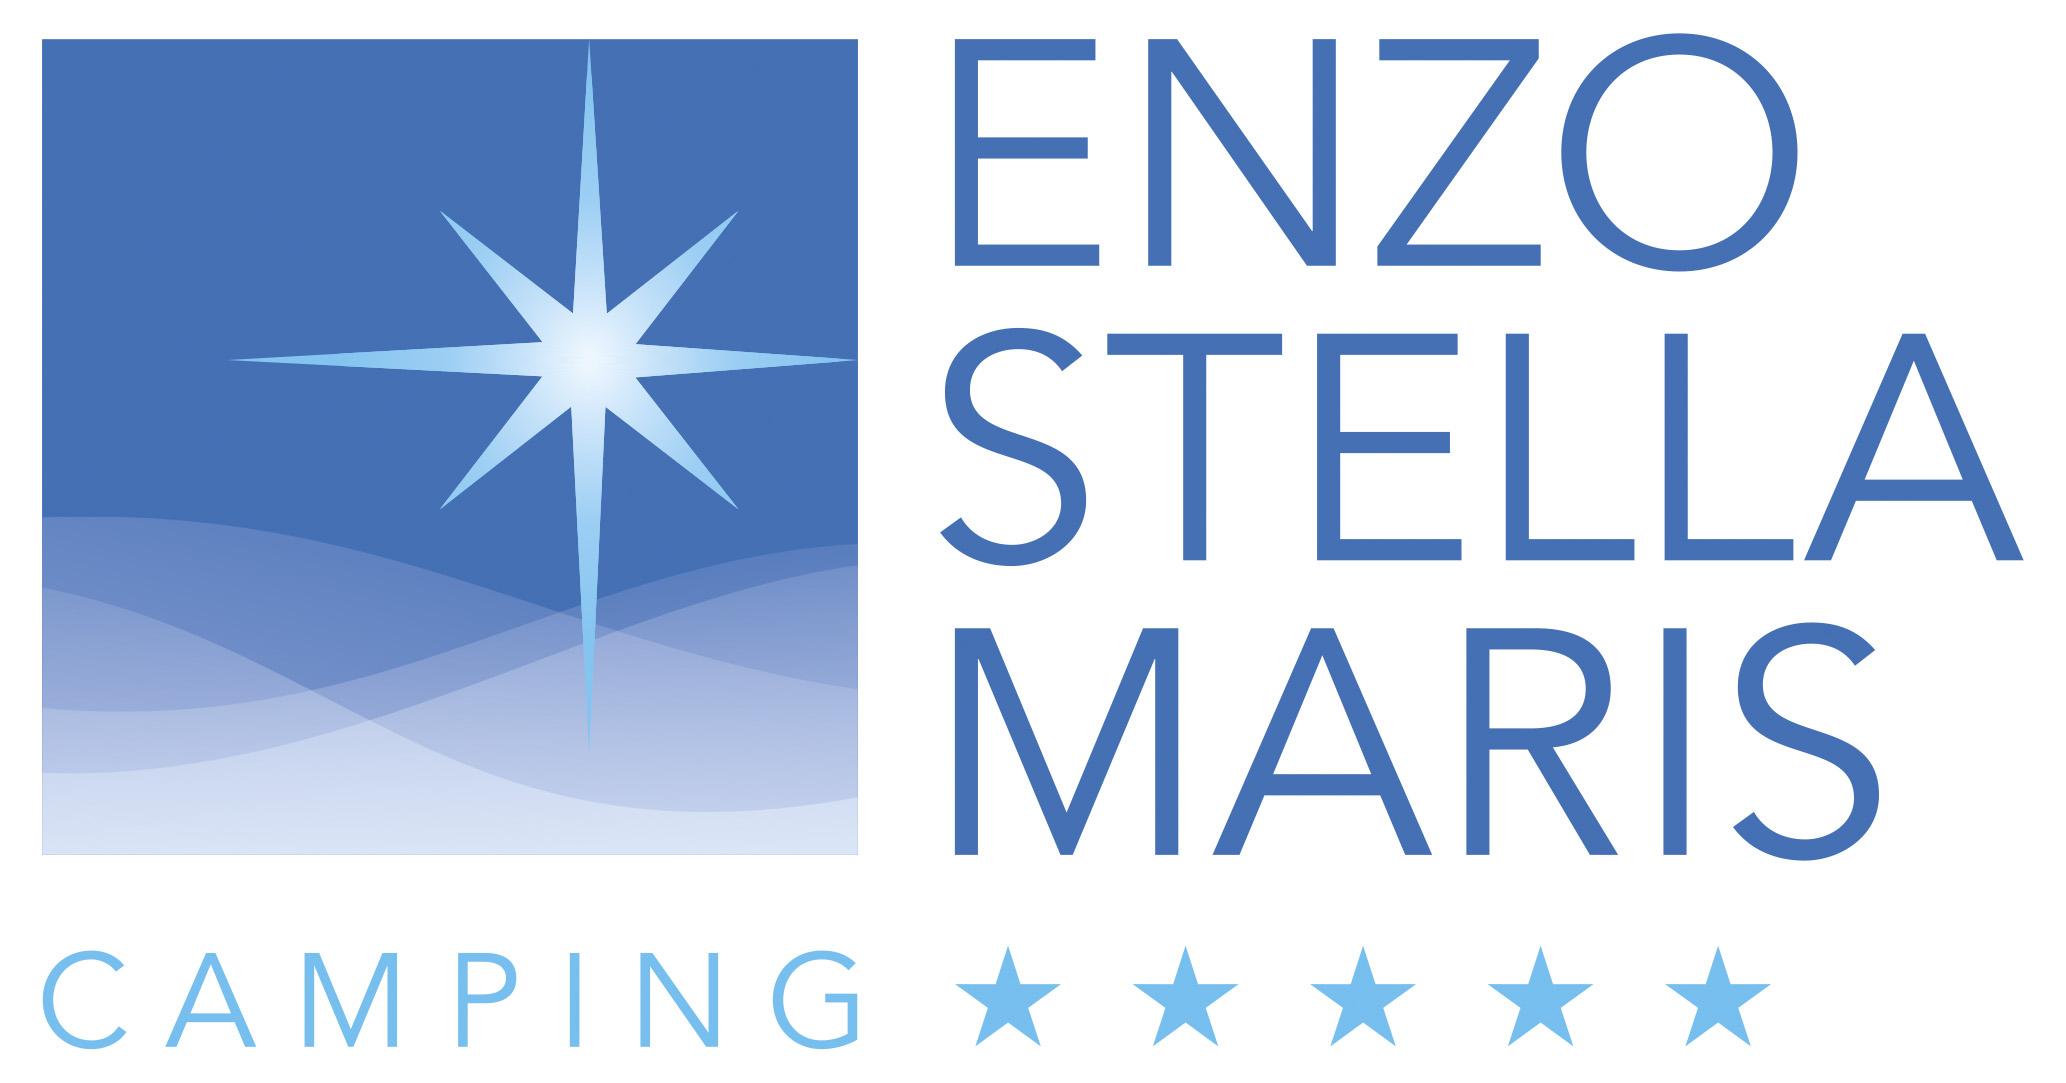 Camping Enzo Stella Maris